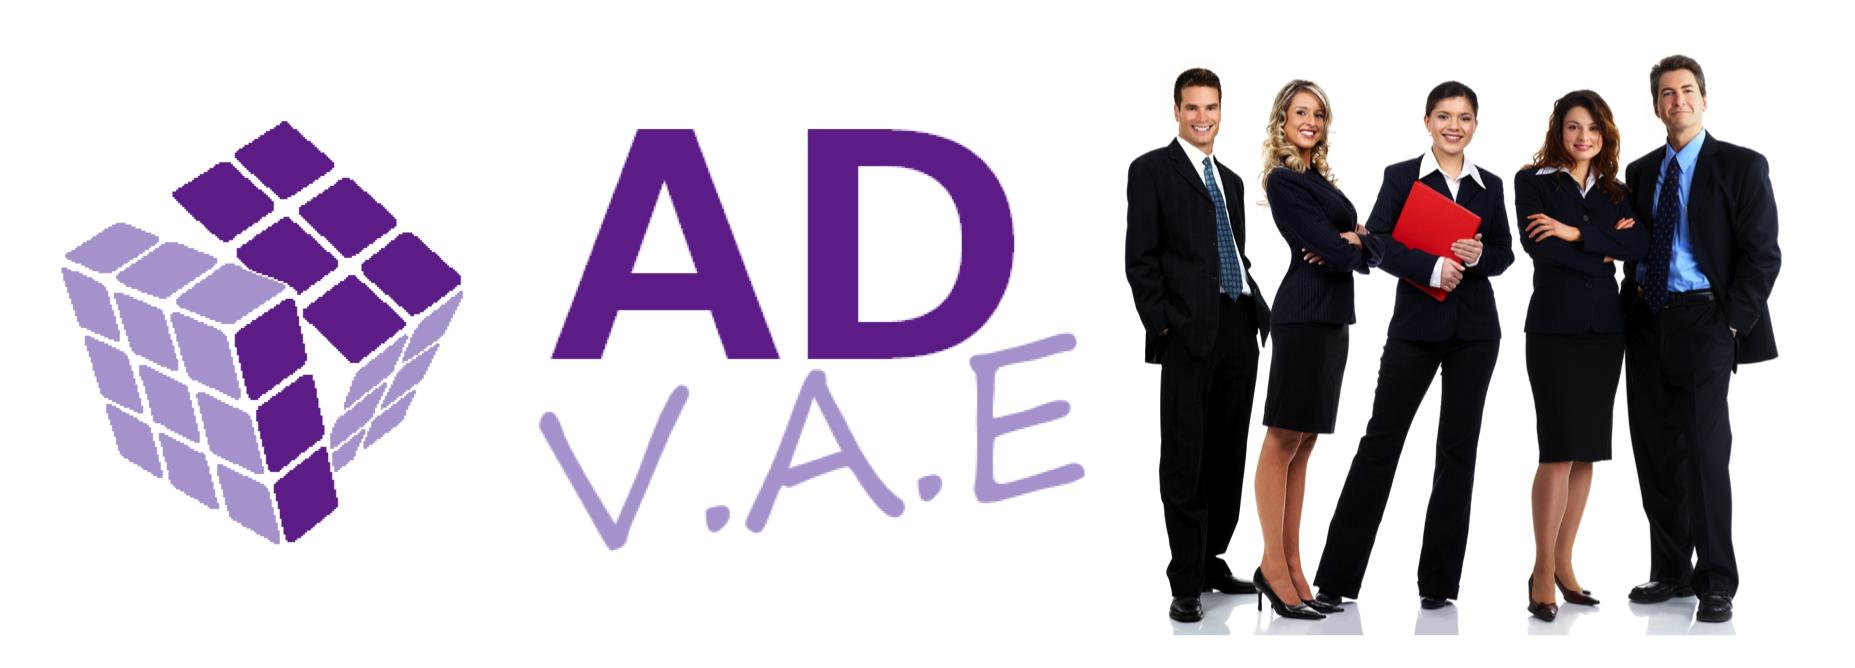 Blog de la VAE - ADVAE - VAE Les 2 Rives - Association - Paris